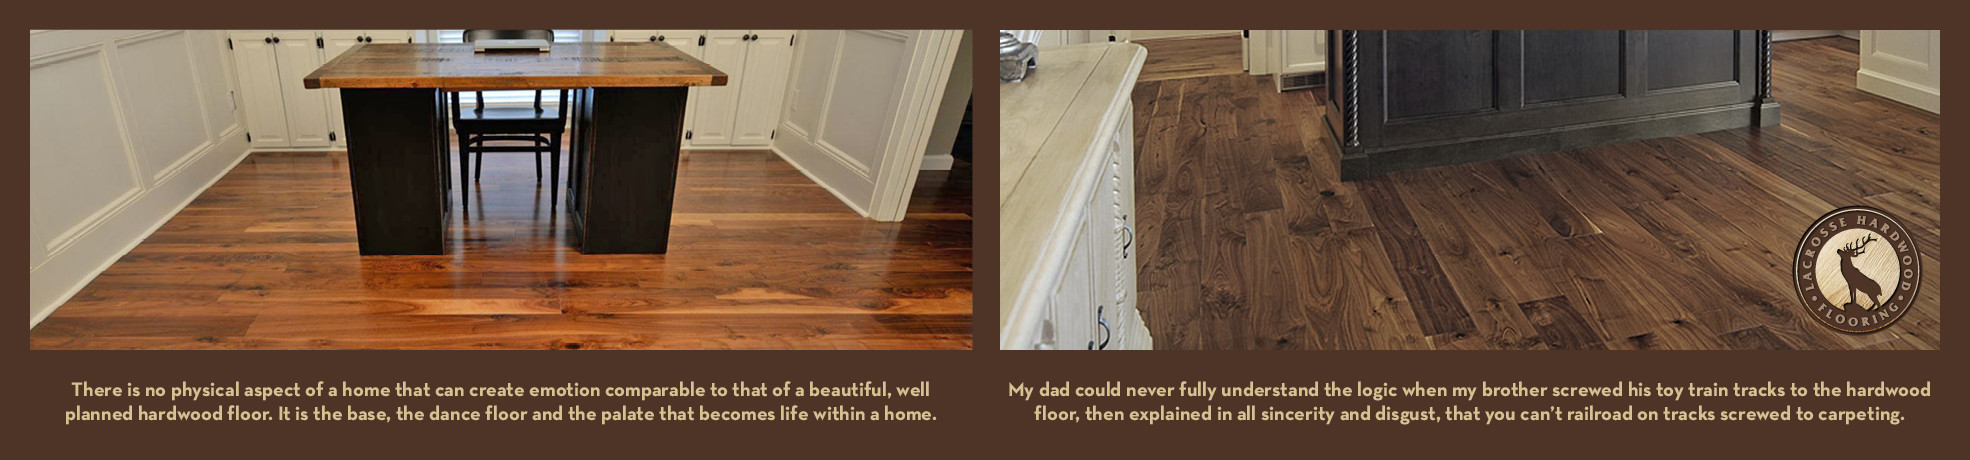 black walnut hardwood flooring prices of lacrosse hardwood flooring walnut white oak red oak hickory within lhfsliderv22